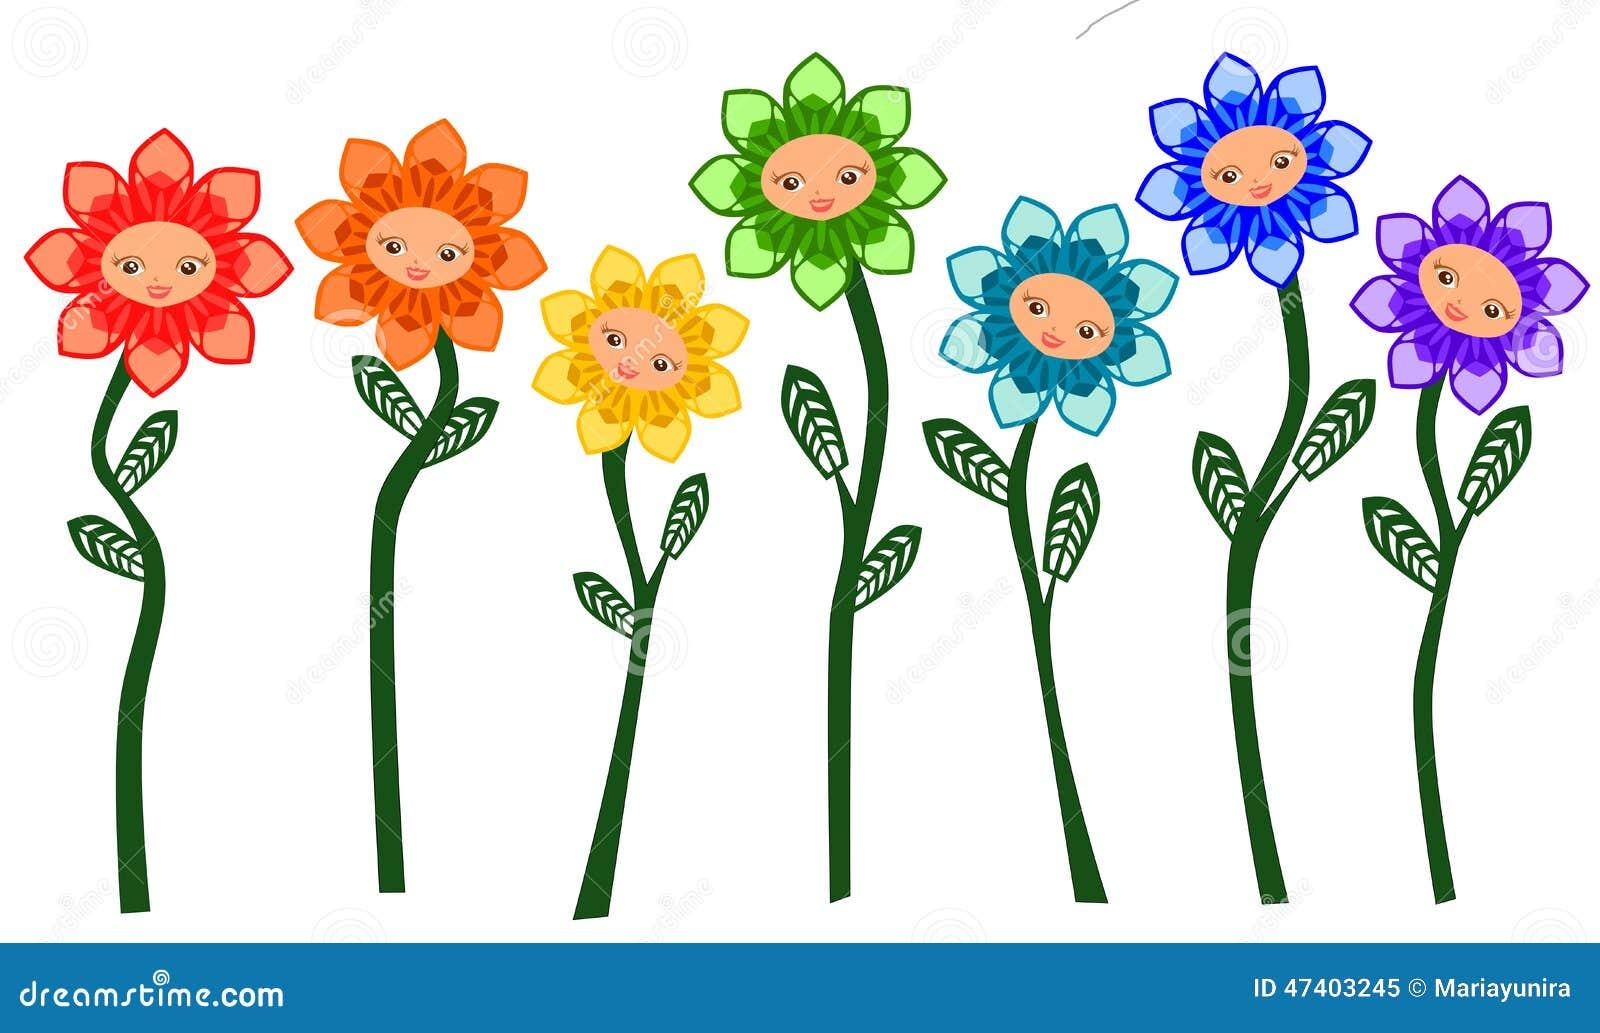 Rainbow Flowers Cartoon Vector Stock Vector - Image: 47403245